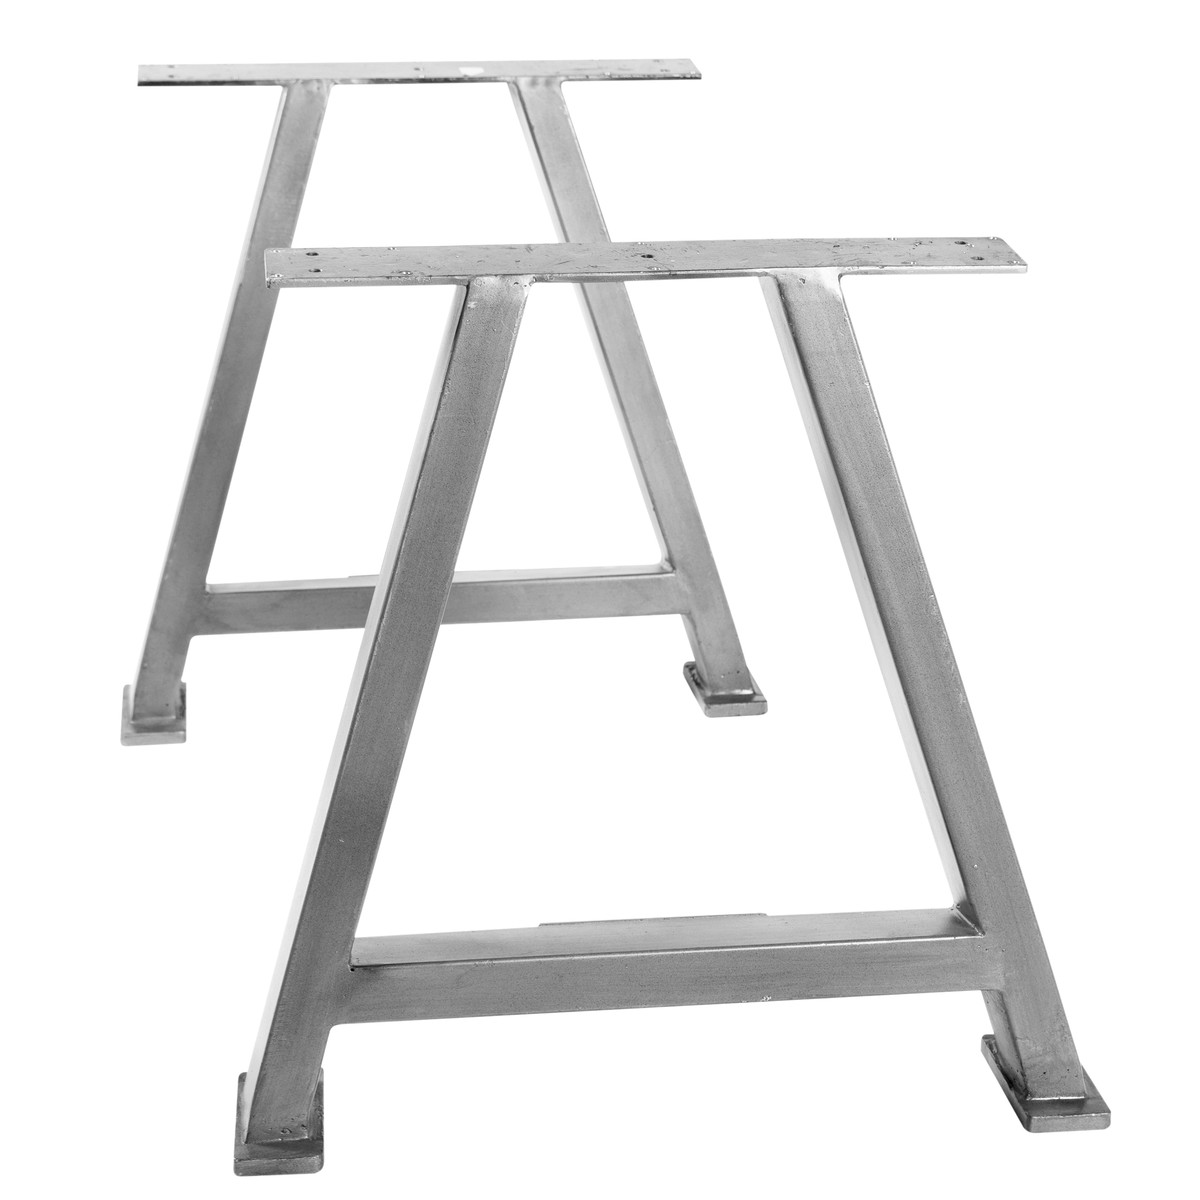 TOPS & TABLES Tischgestell antiksilber